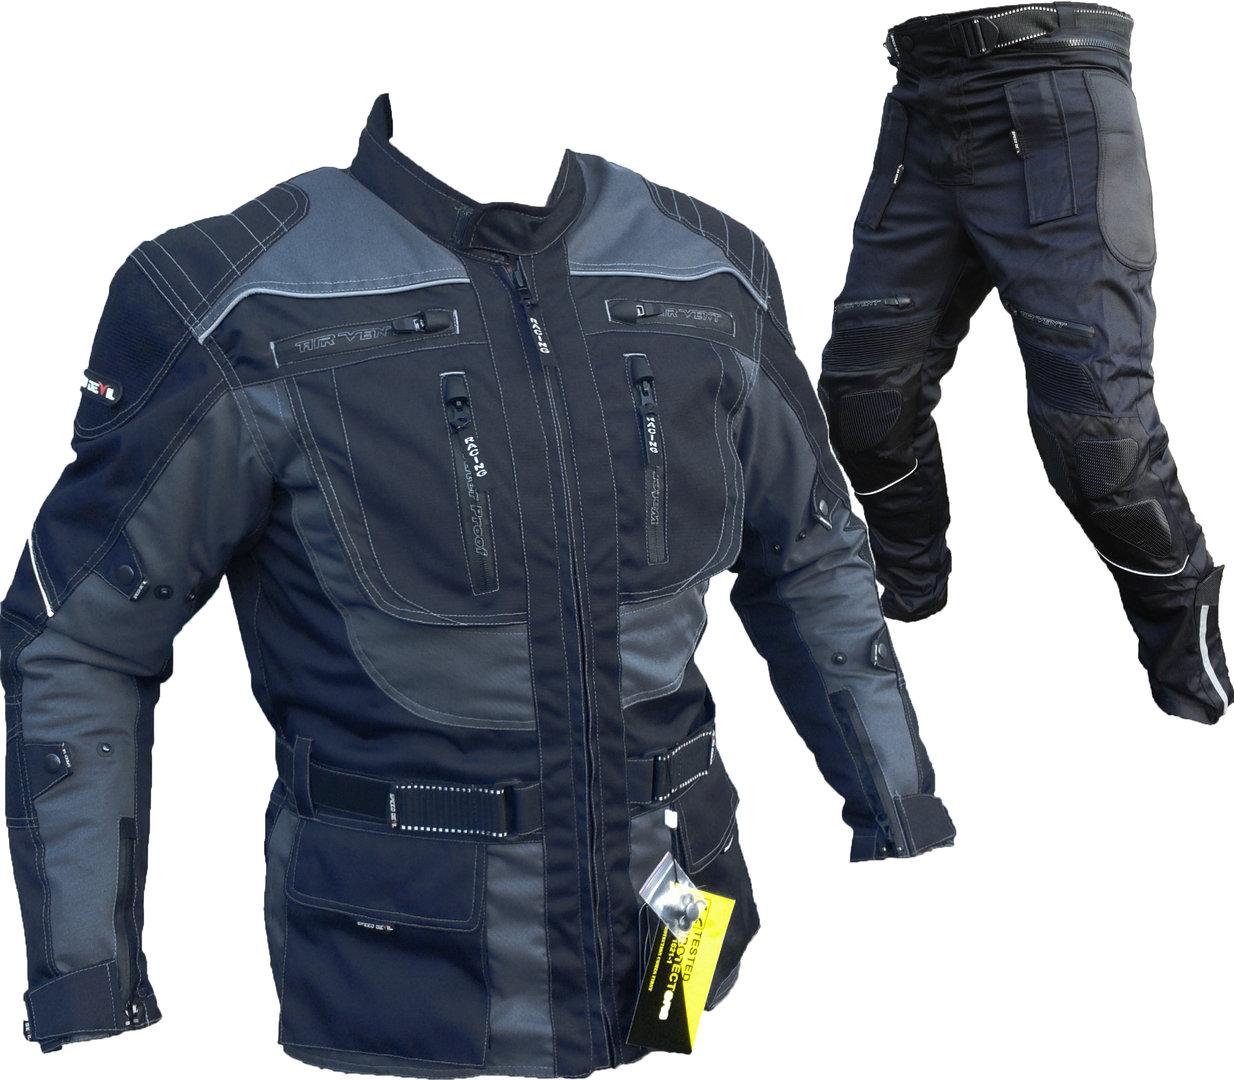 Textilkombi MONTANA - Speed Devil Motorradbekleidung